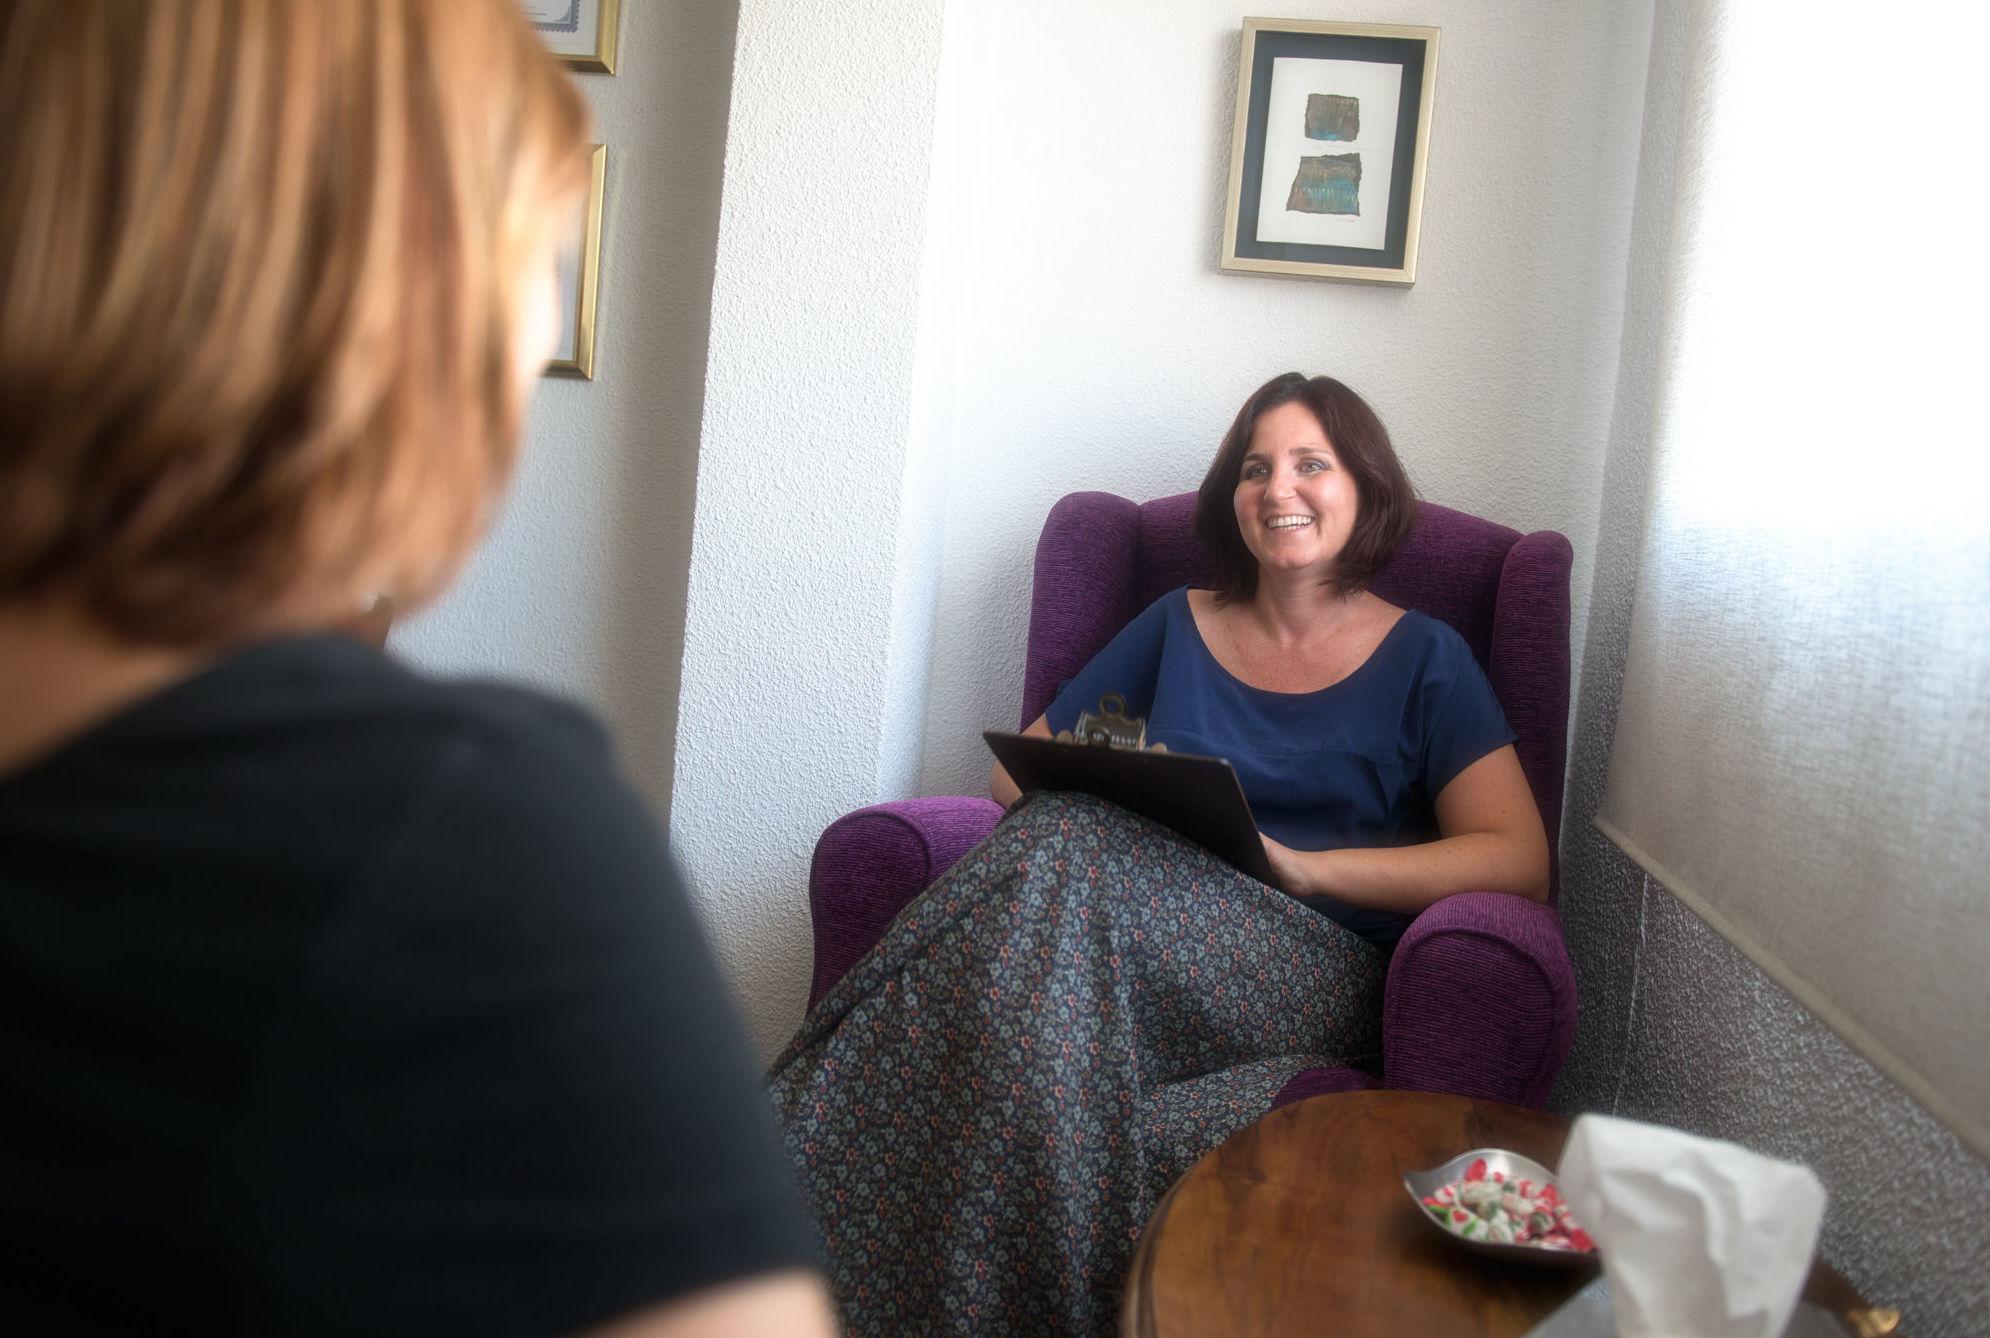 Foto 9 de Psicólogos en Alboraia | Psicóloga Helga Puerta